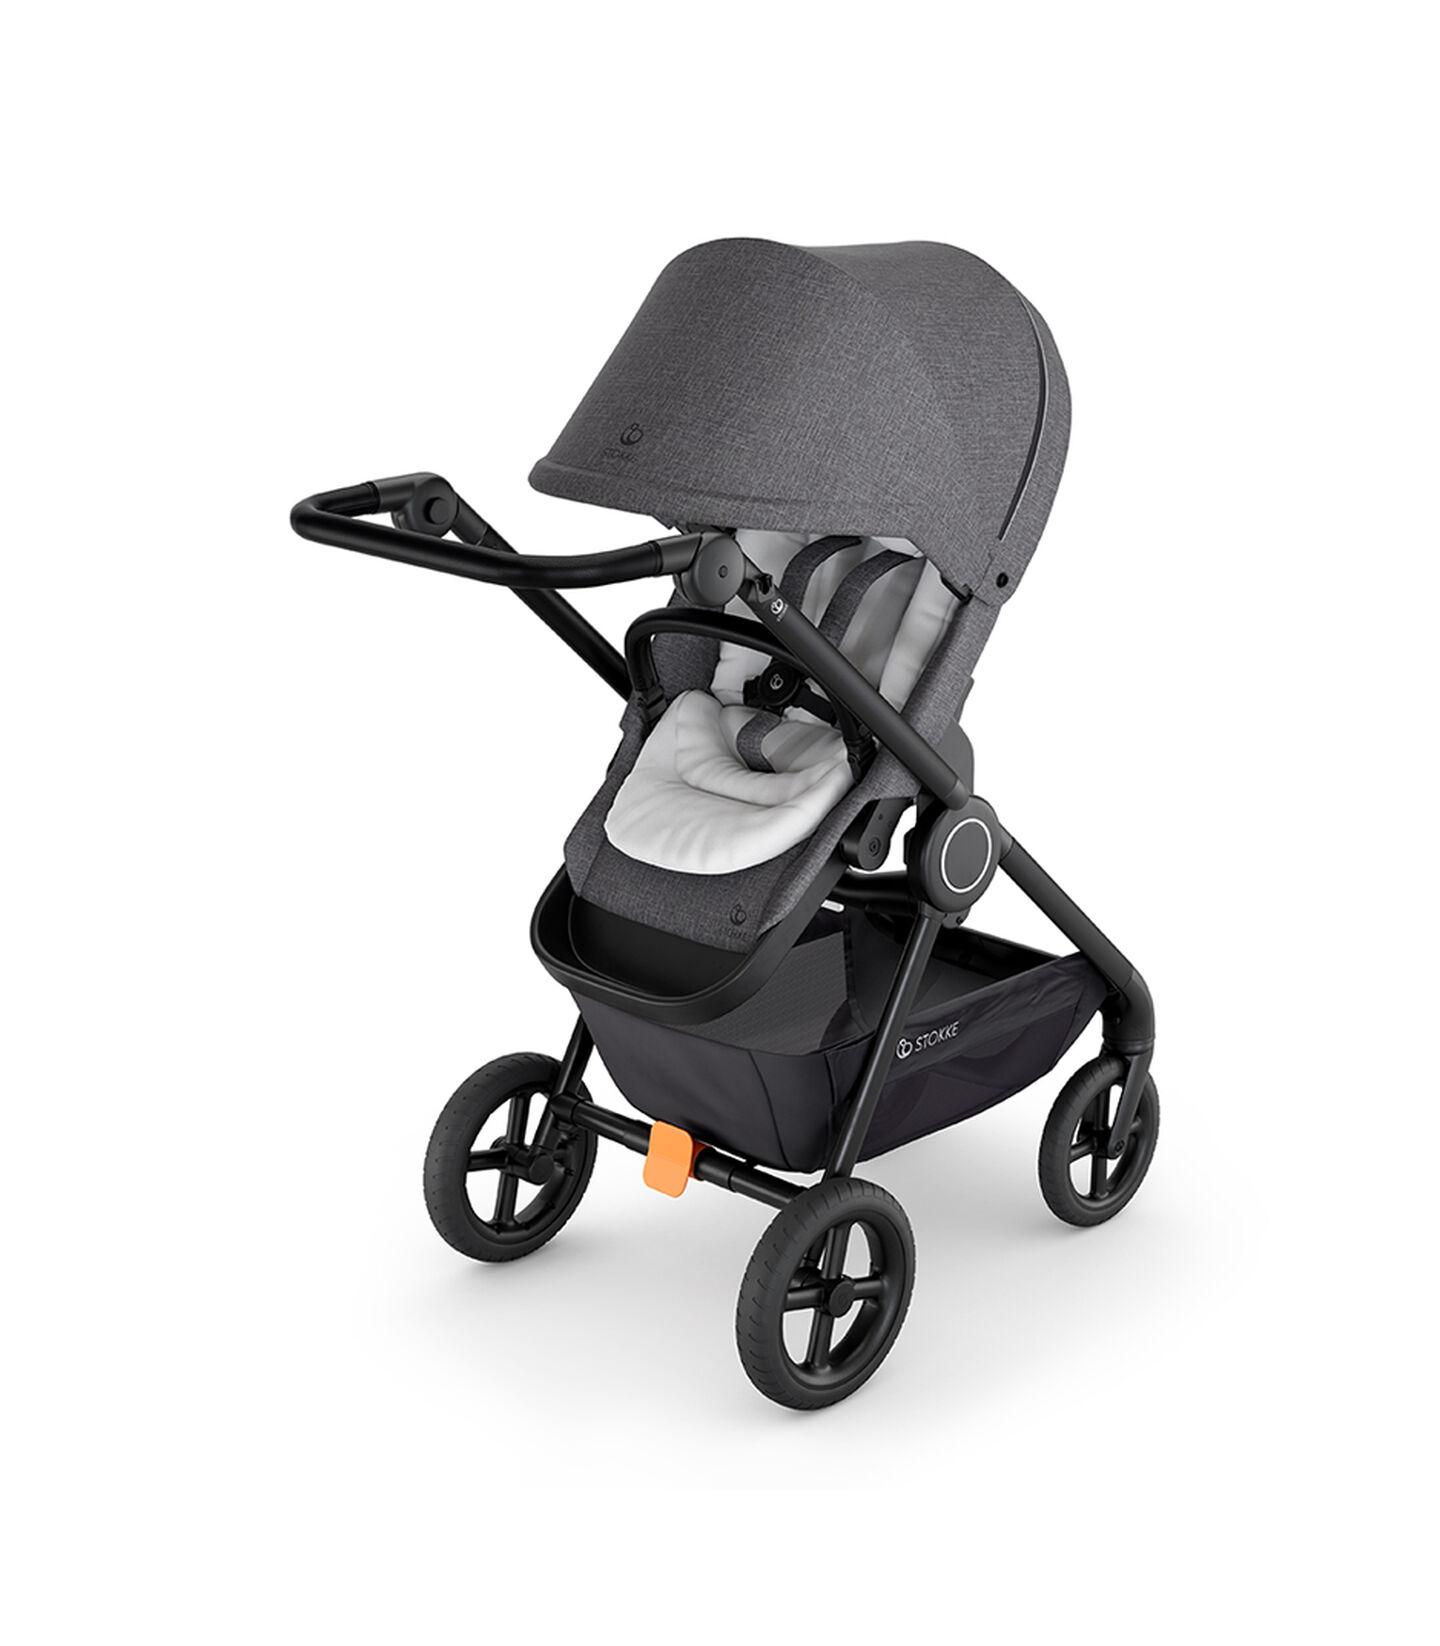 Stokke kinderwagen infant insert, , mainview view 2